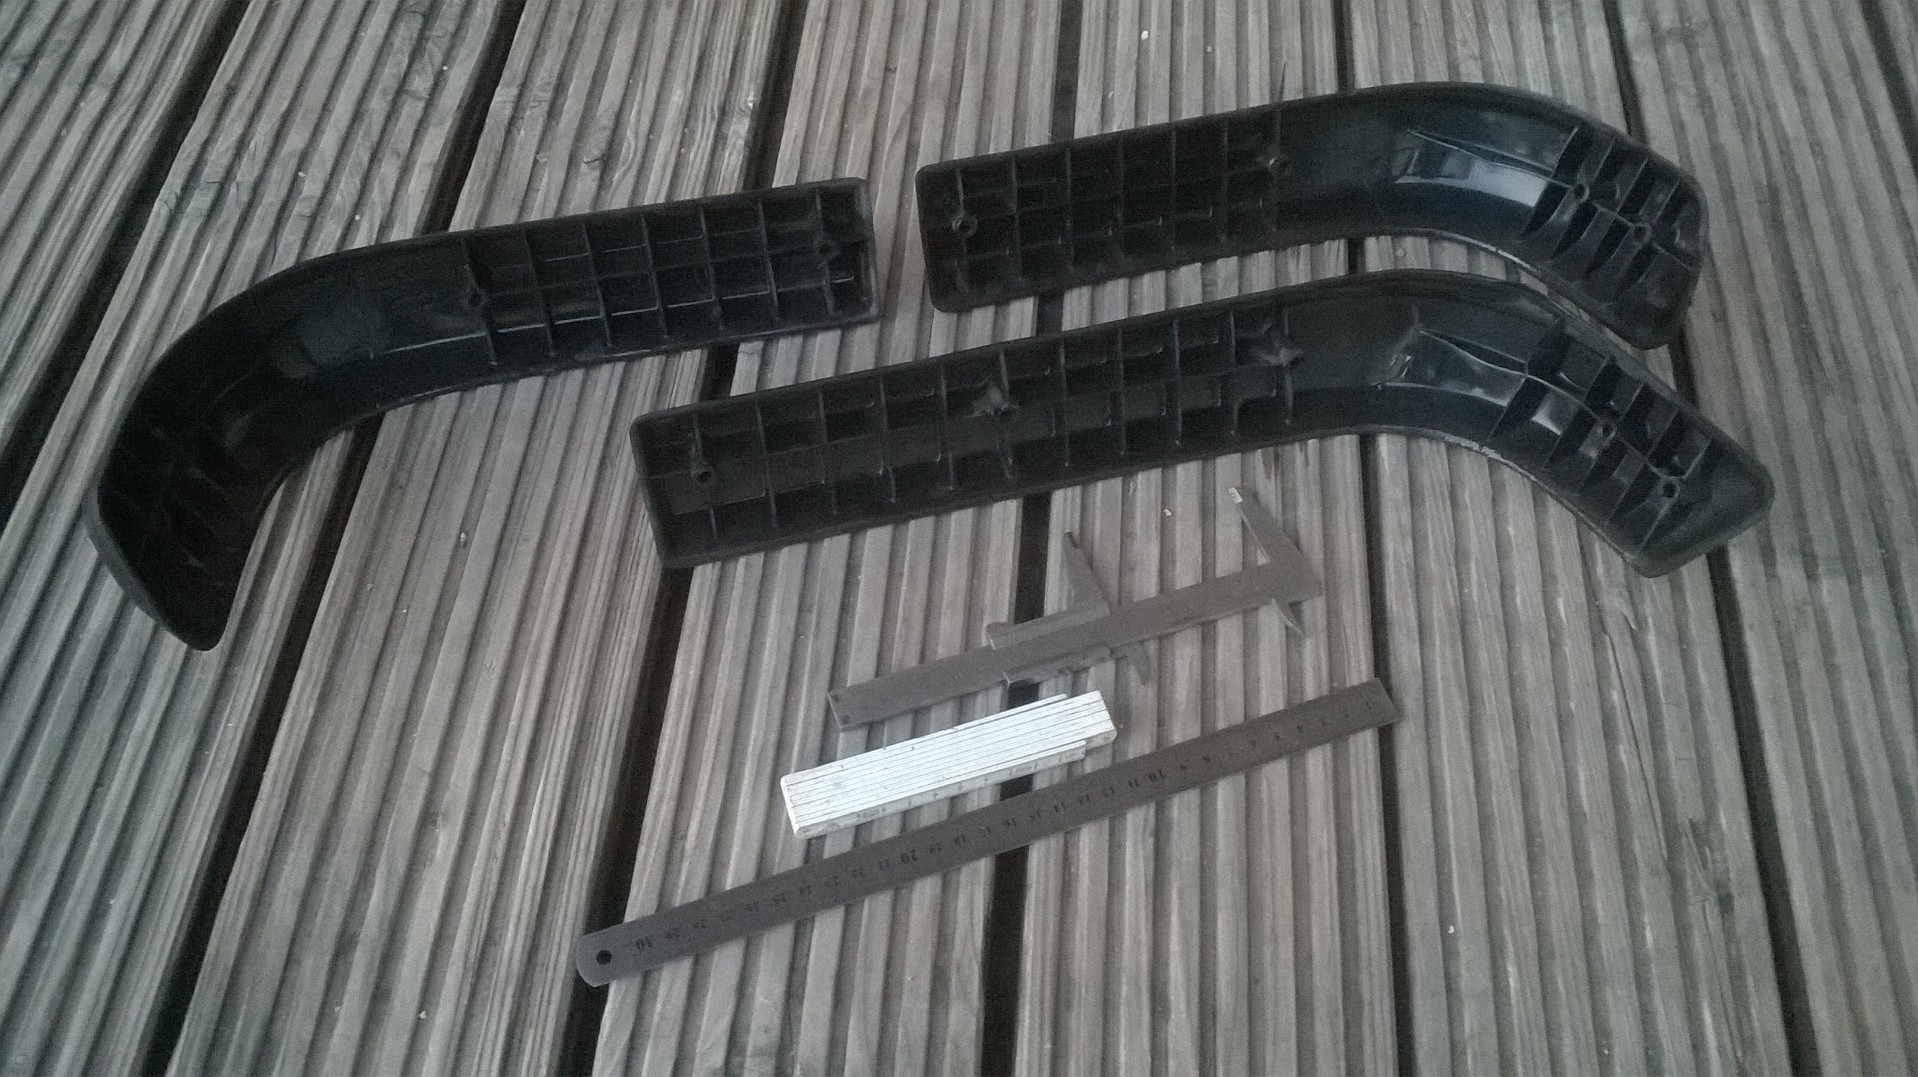 jeepCherokeeChief-Store-grand-wagonner-bumper-samples-1